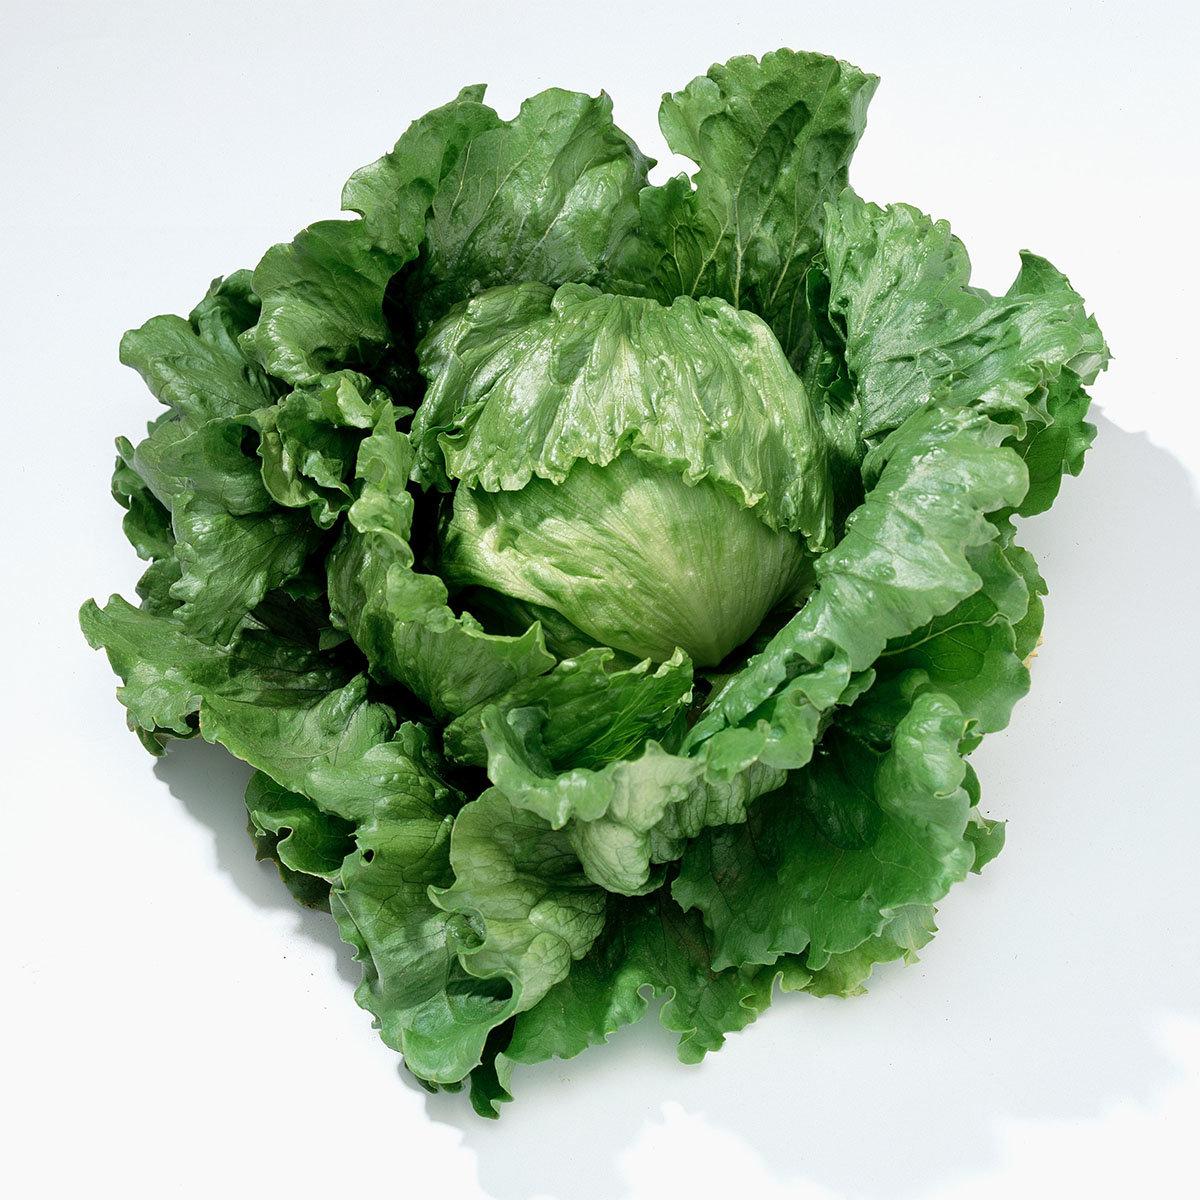 Saatgut-Holzbox Salatvielfalt, 7 Saatgut-Sorten | #4